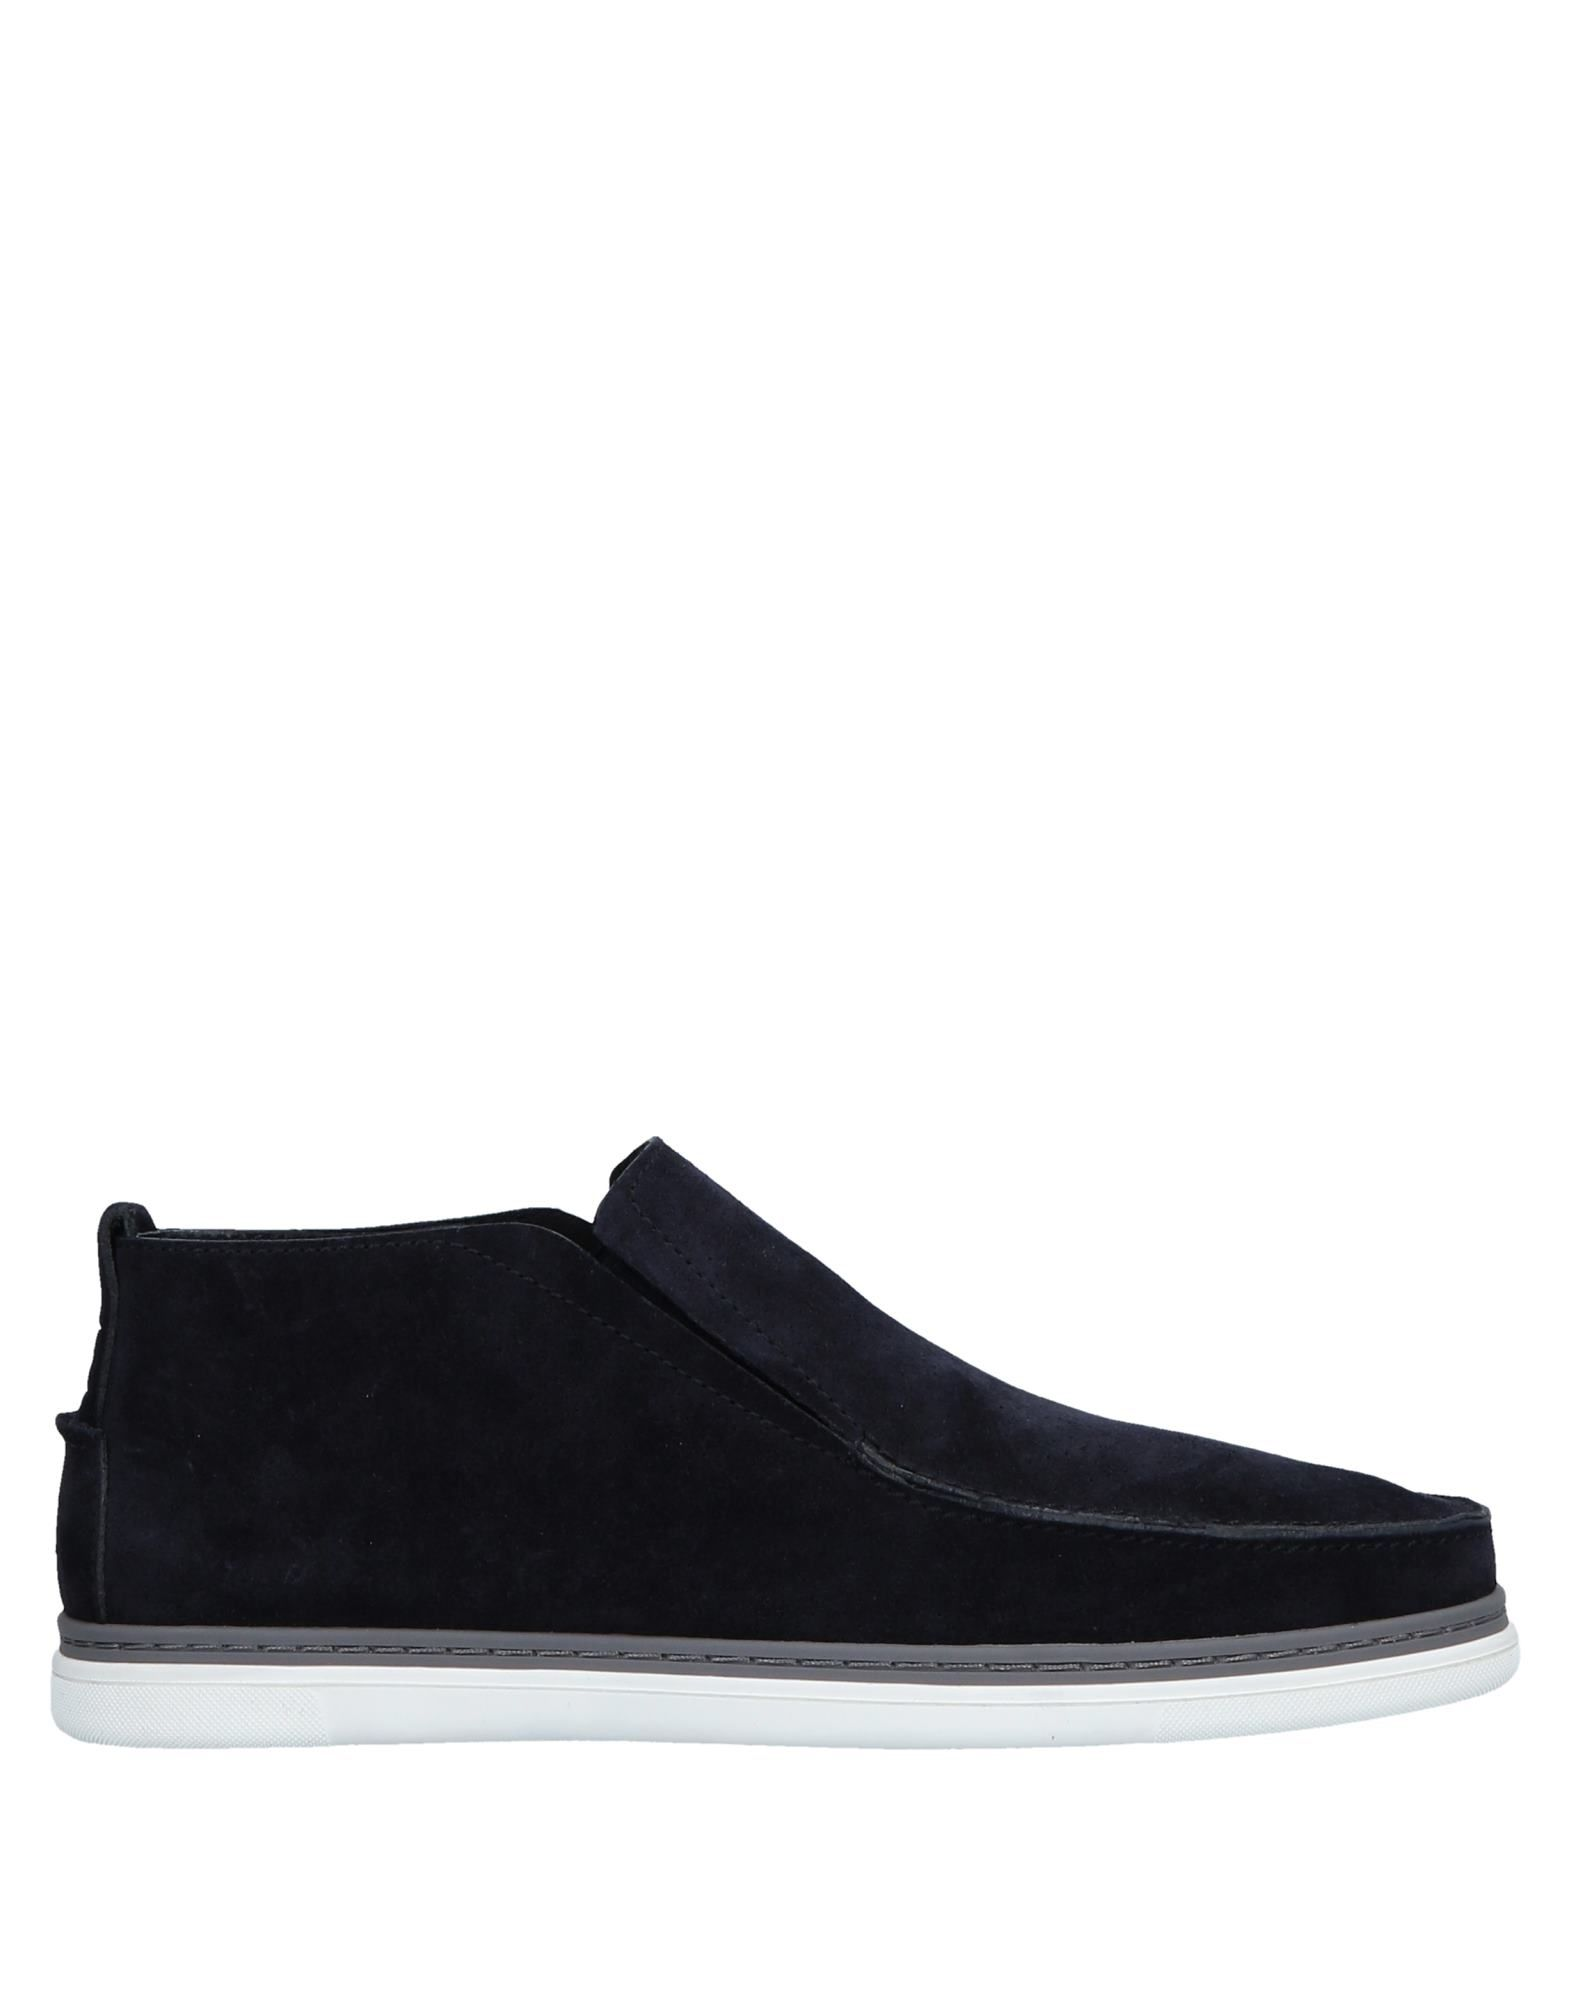 Ermenegildo Zegna Stiefelette Herren  11518916OA Gute Qualität beliebte Schuhe